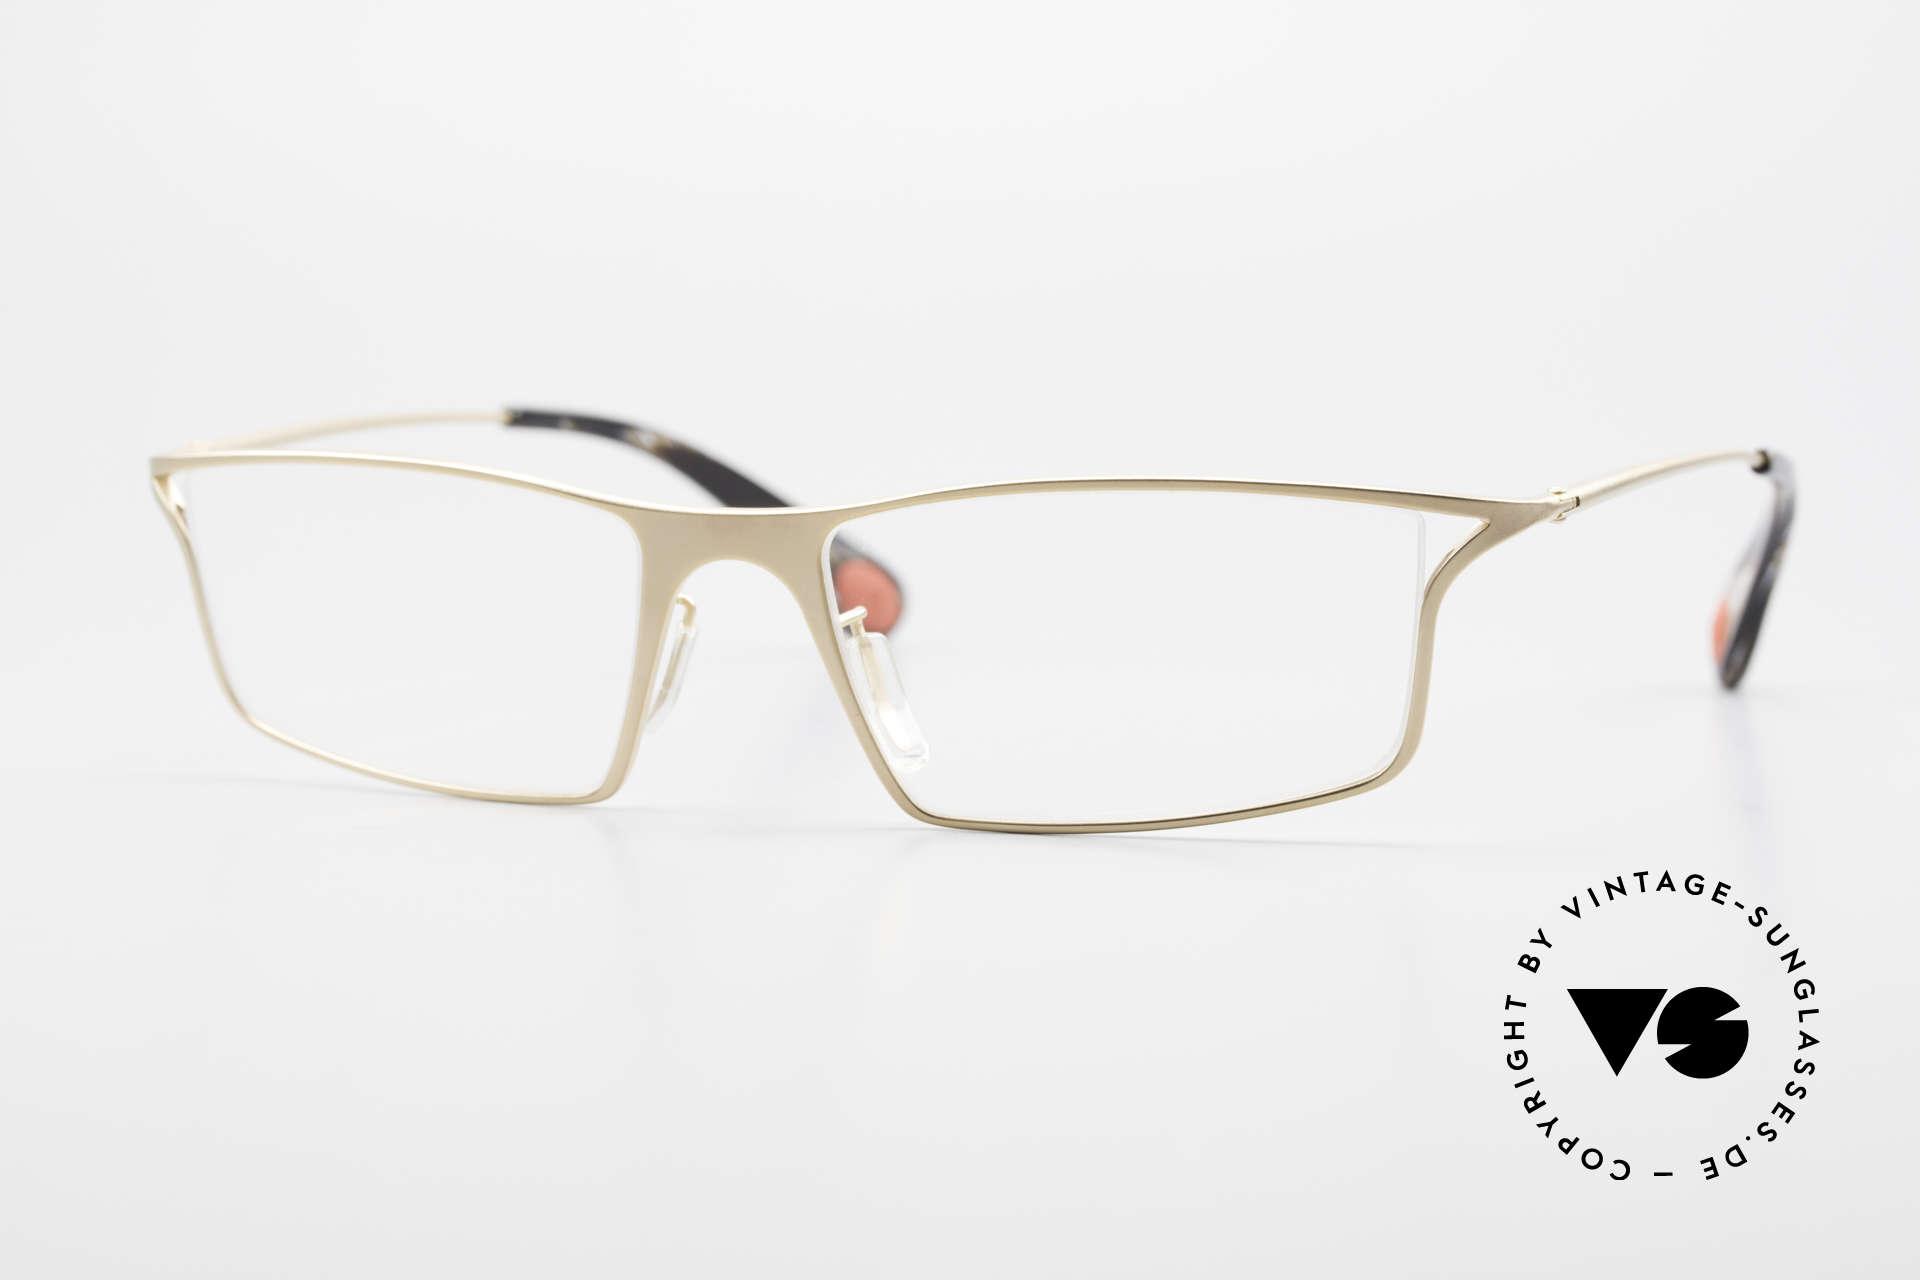 Bugatti 353 Odotype Men's Luxury Eyeglass Frame, legendary Odotype series for Bugatti fanciers, Made for Men